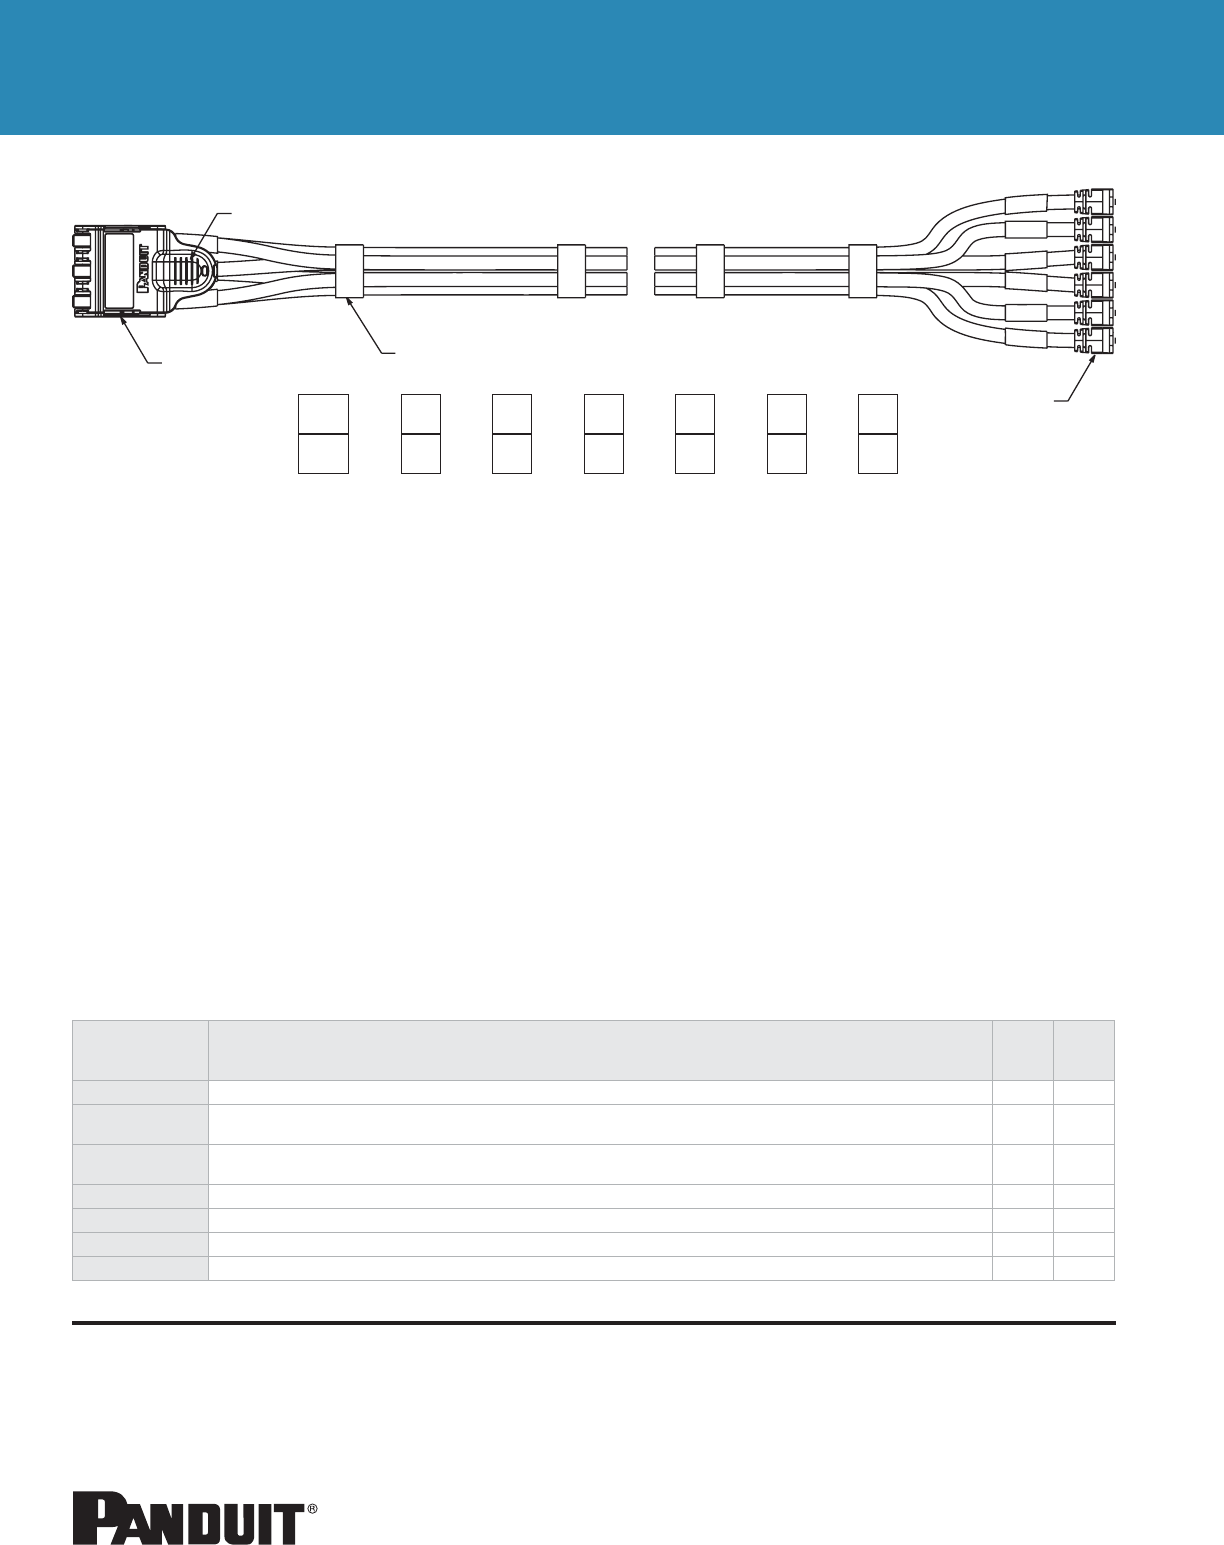 Ww Cocb17 Quicknet Plug Pack Assemblyqxp Panduit Rj45 Wiring Diagram A